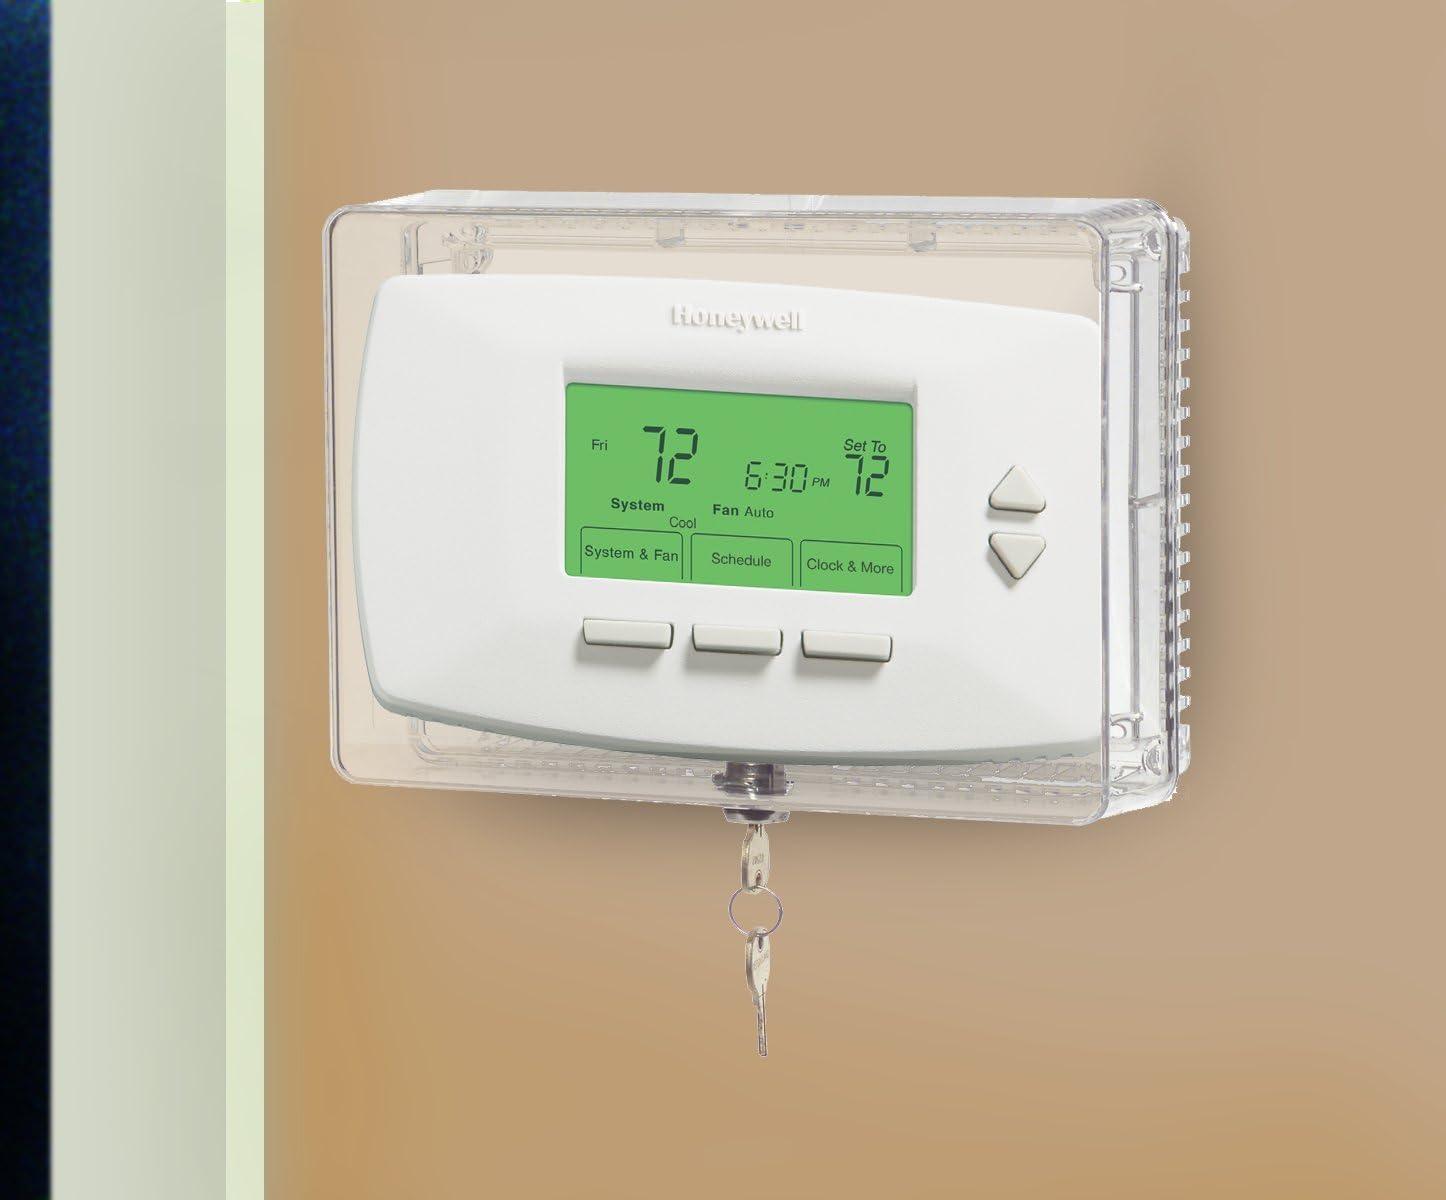 B000BPGP6M Honeywell CG511A1000 Medium Inner Shelf to Prevent Tampering Thermostat Guard, White 41AiNyPS4NL